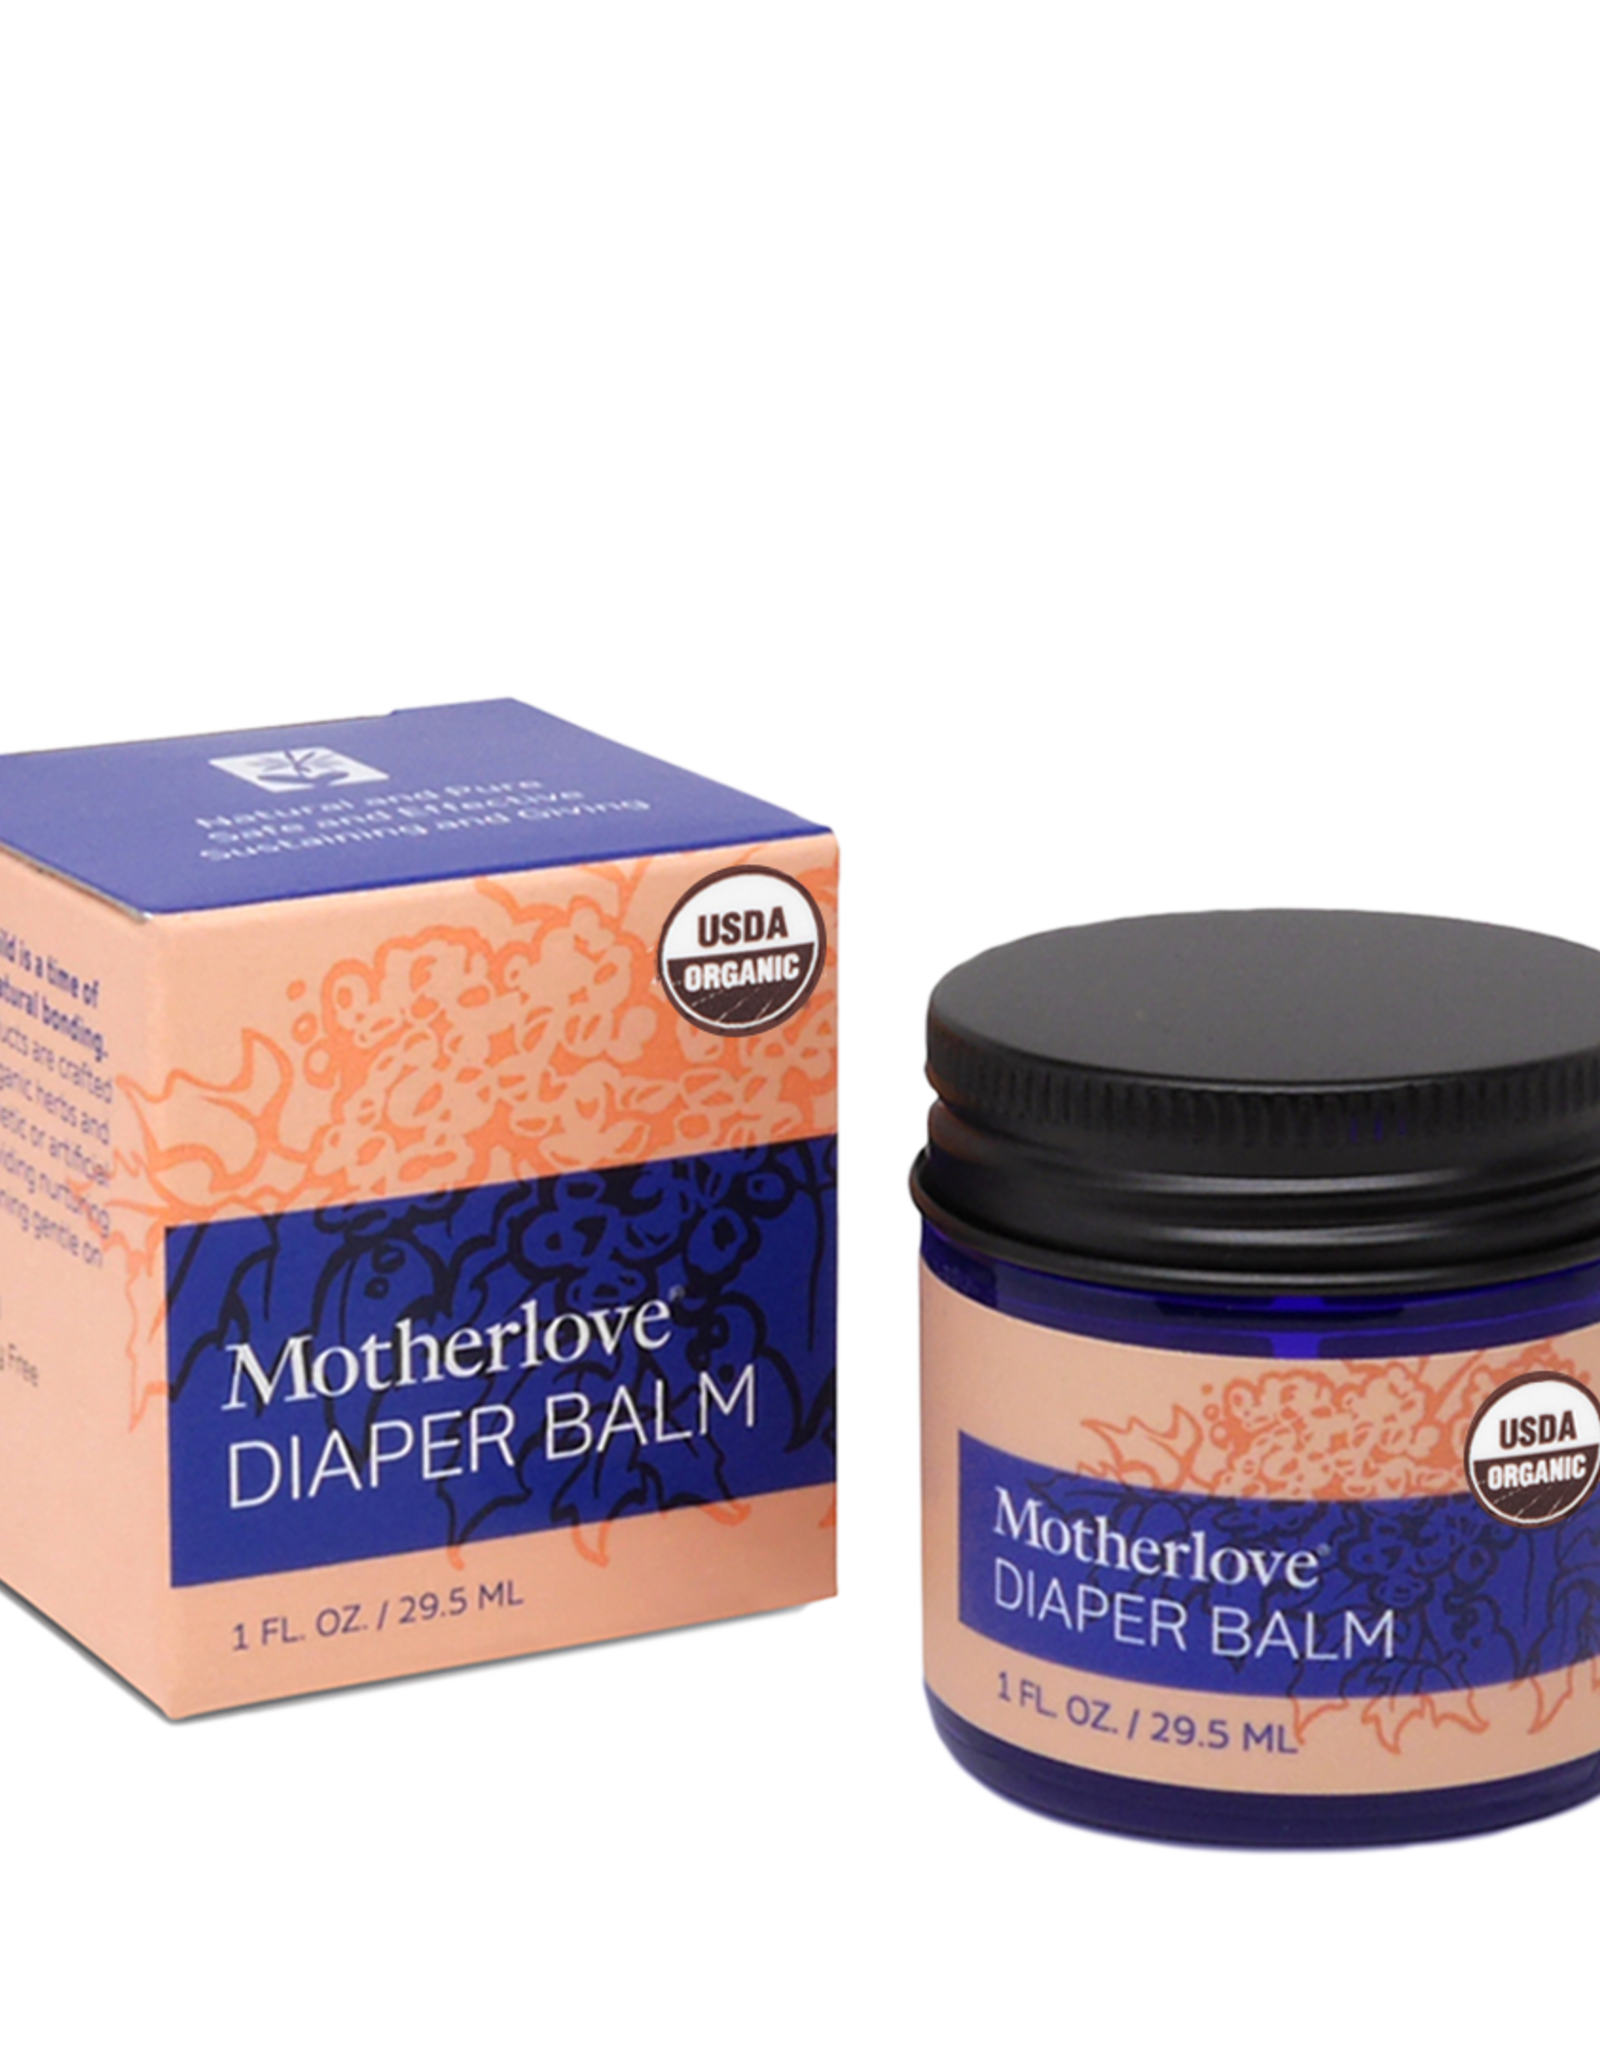 Motherlove Diaper Balm 1 oz.